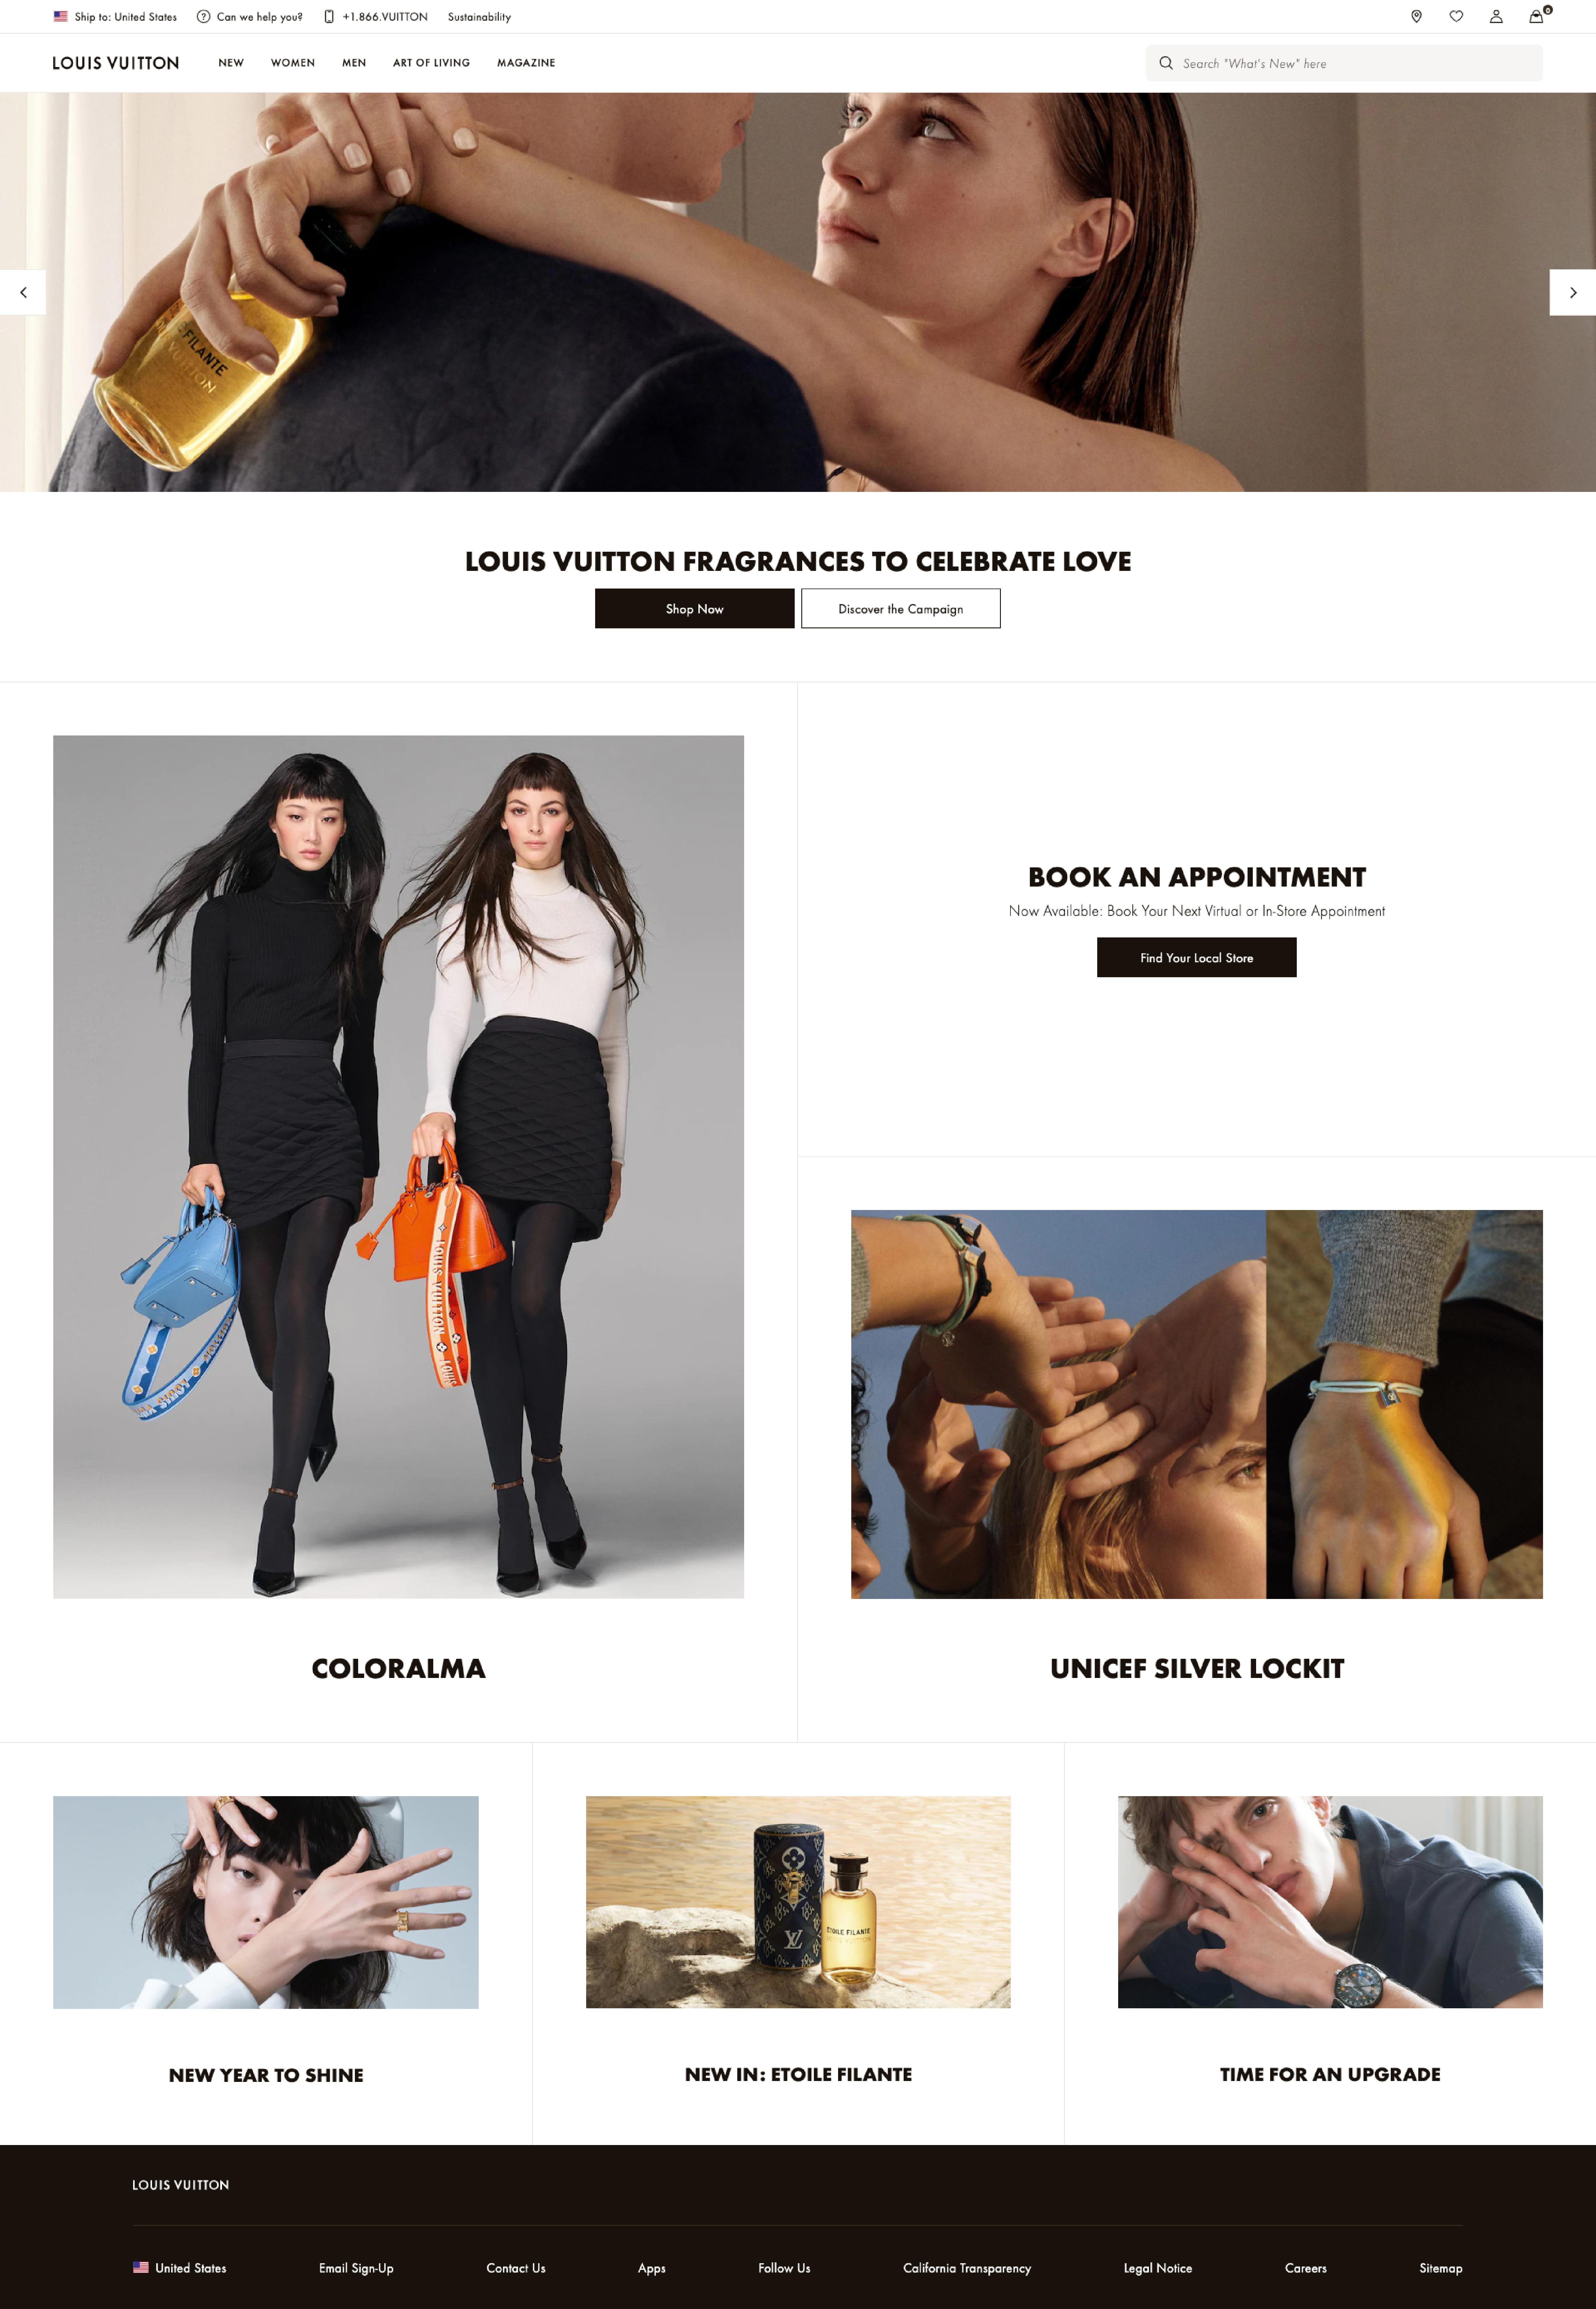 G & Co. - Louis Vuitton Mobile App Development, Louis Vuitton Development Agency, Louis Vuitton Web Design Agency, Louis Vuitton App Agency, Louis Vuitton eCommerce Agency, Louis Vuitton UI/UX Agency, Louis Vuitton Digital Agency, Louis Vuitton Marketing Agency, Louis Vuitton Digital Product Strategy Agency